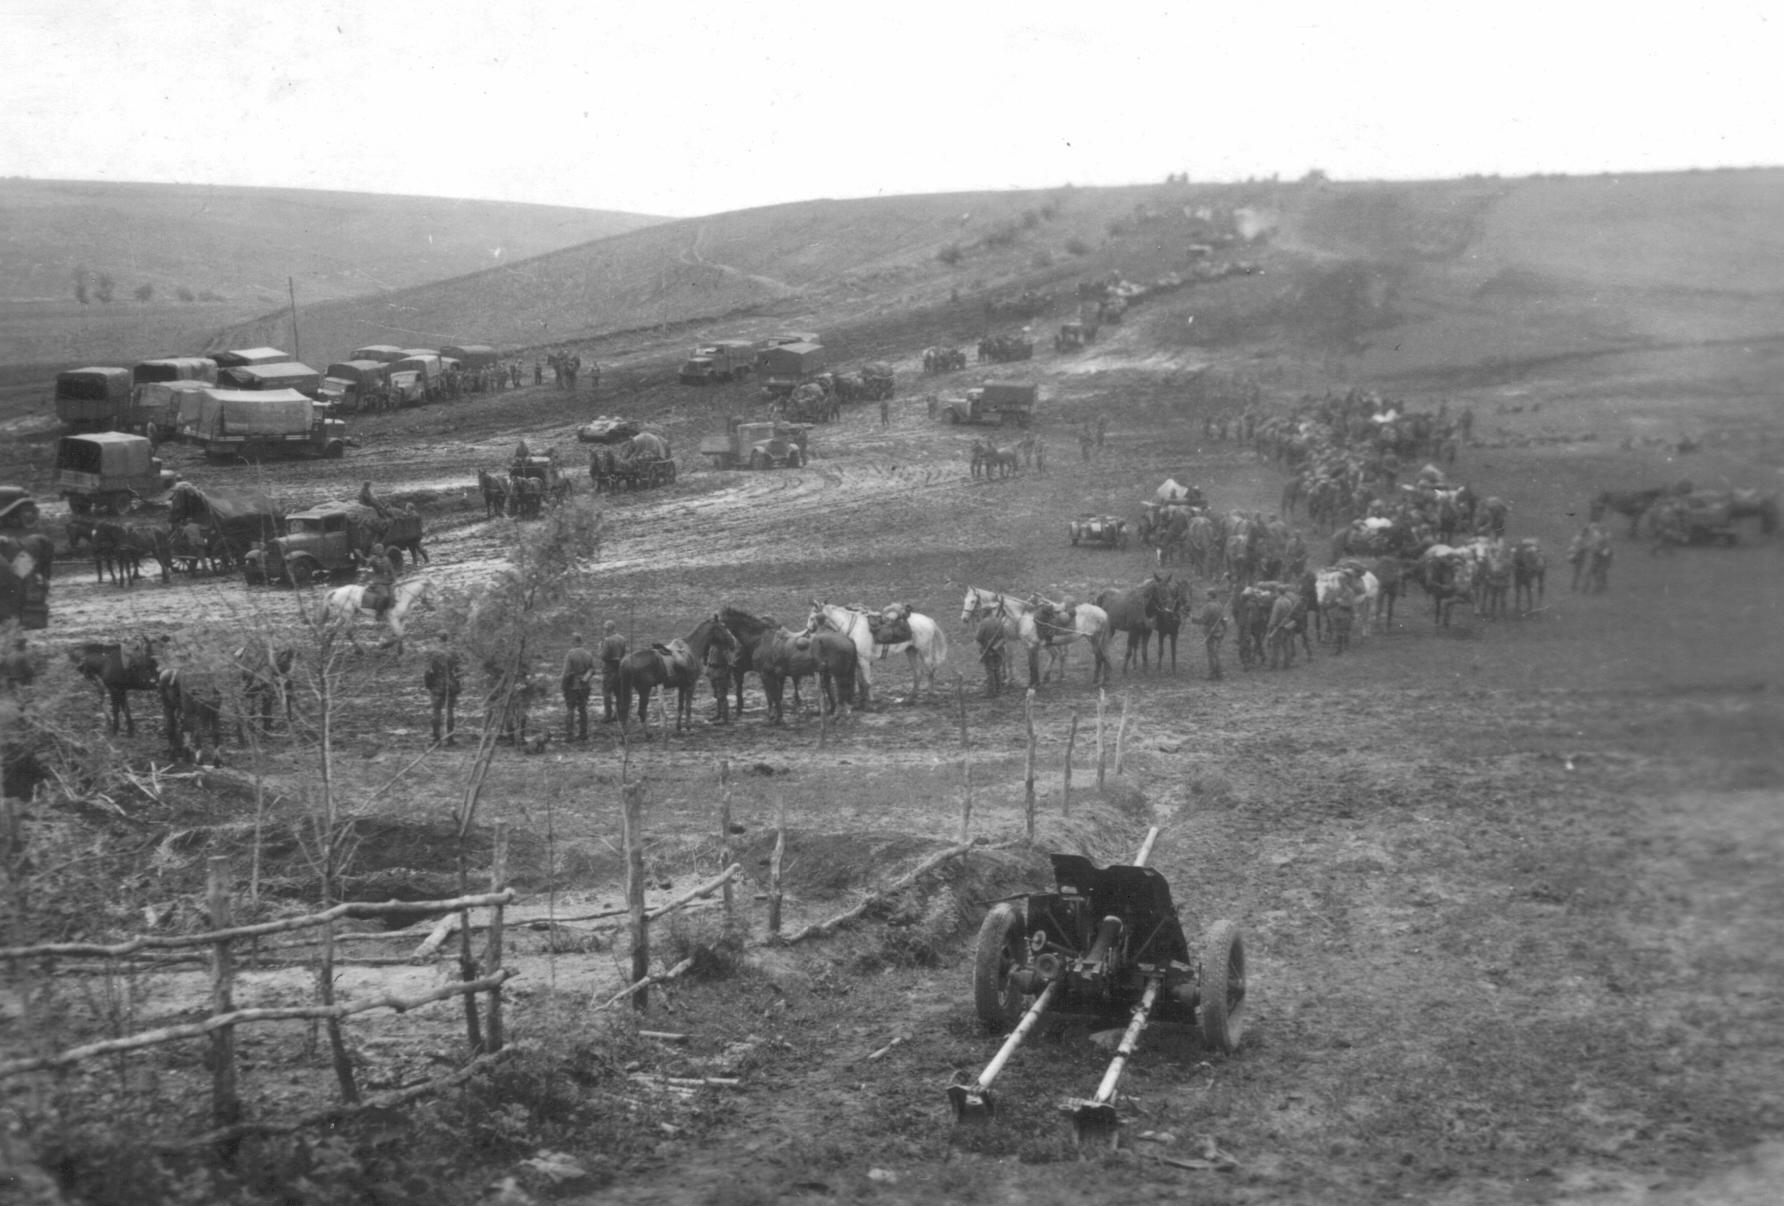 фотография 45-мм противотанкового орудия